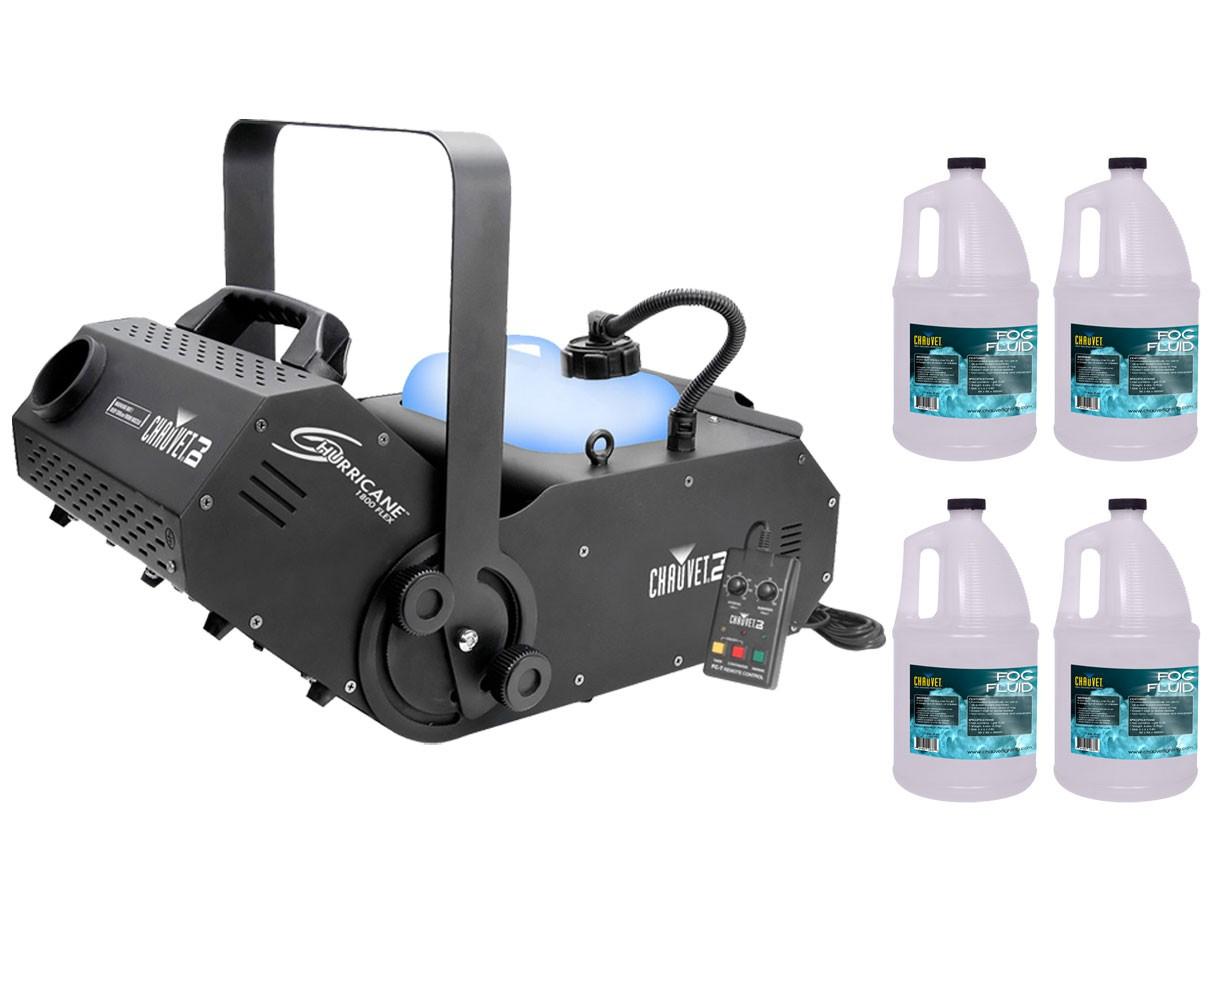 CHAUVET DJ Hurricane 1800 Flex + 4x Fog Fluid